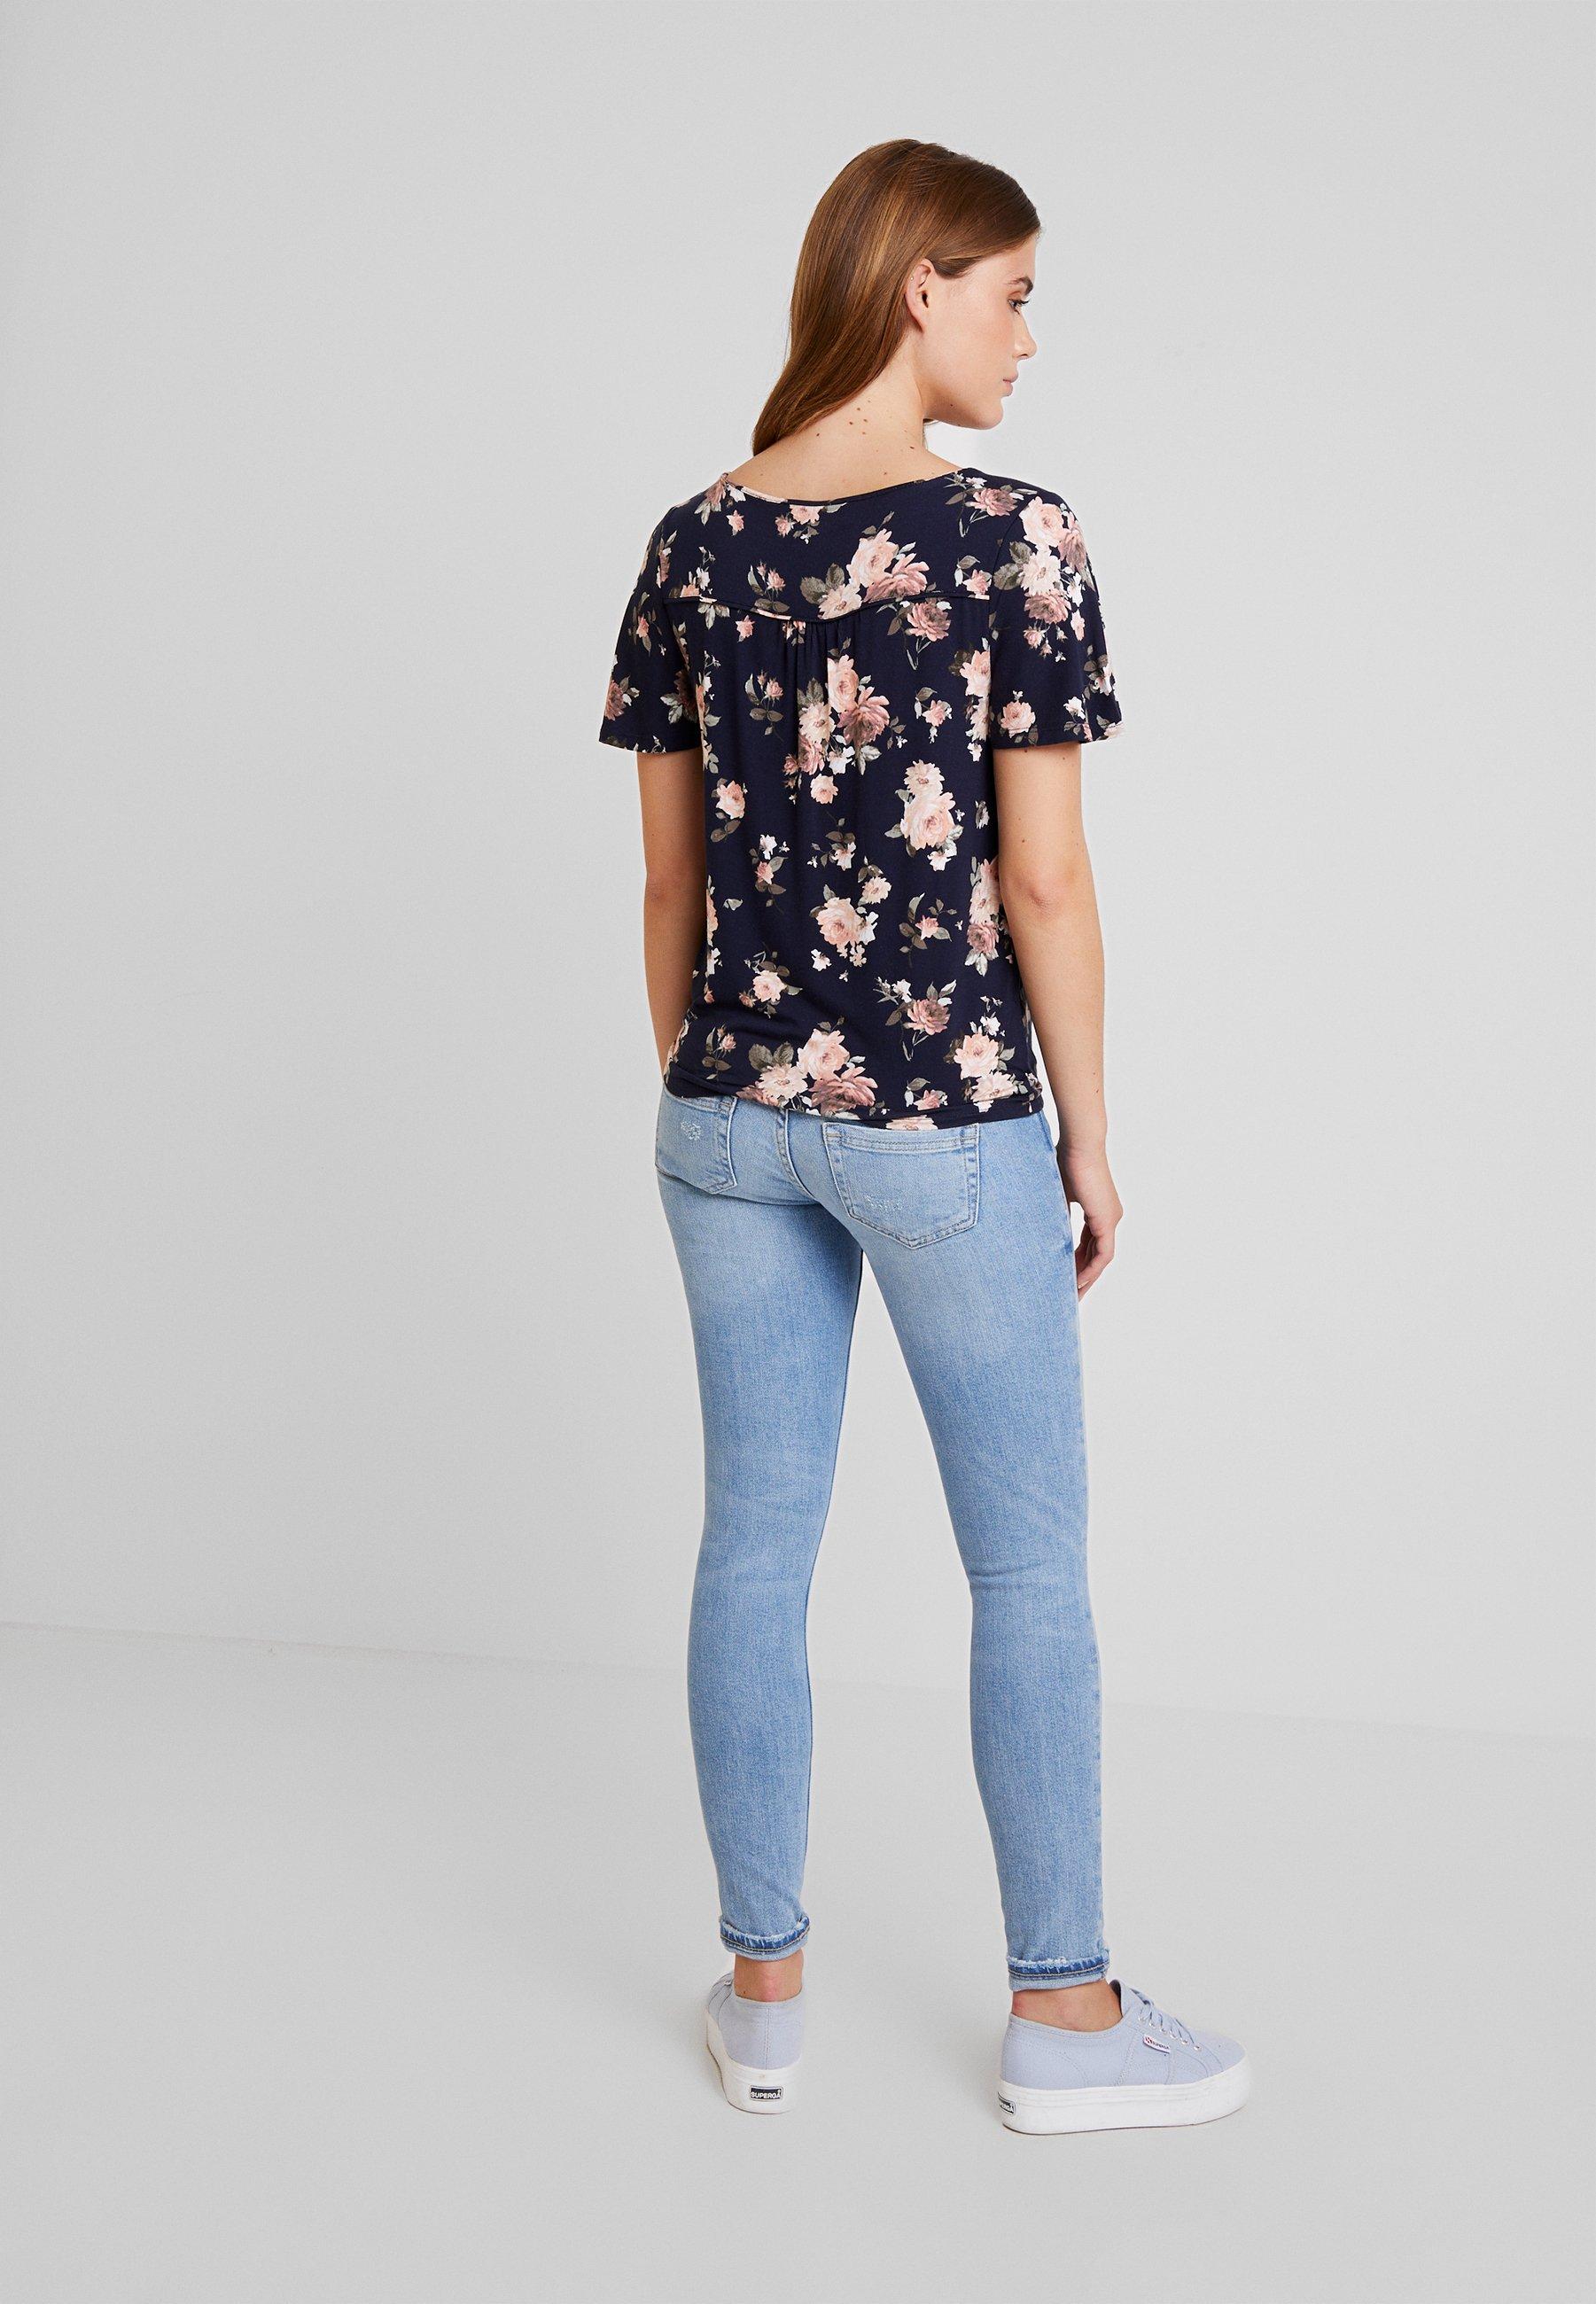 Rose shirt Multi Button Oasis Tie Imprimé blue FrontT Thru 8Pk0Onw